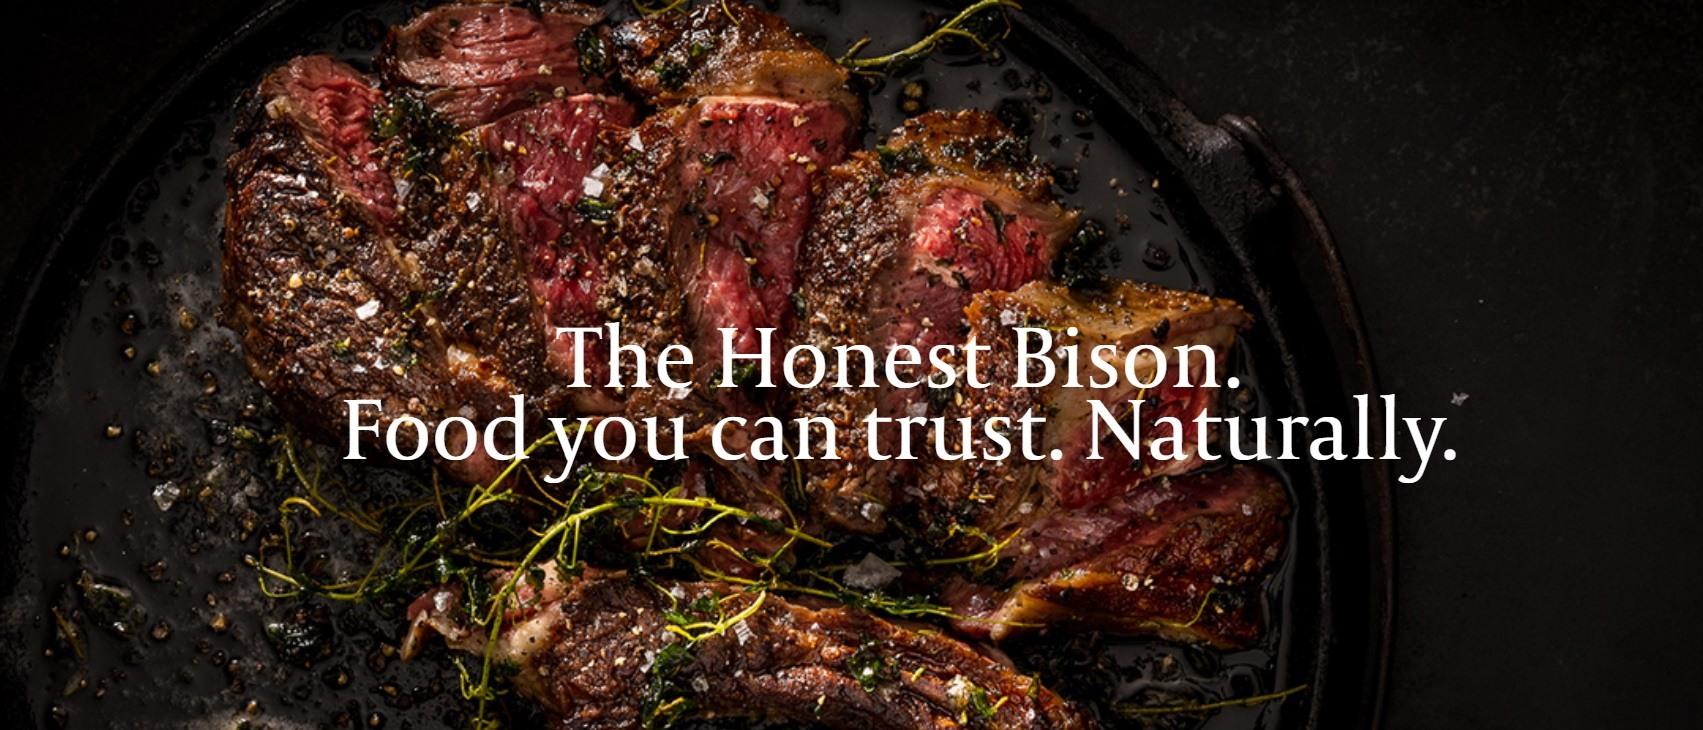 The Honest Bison